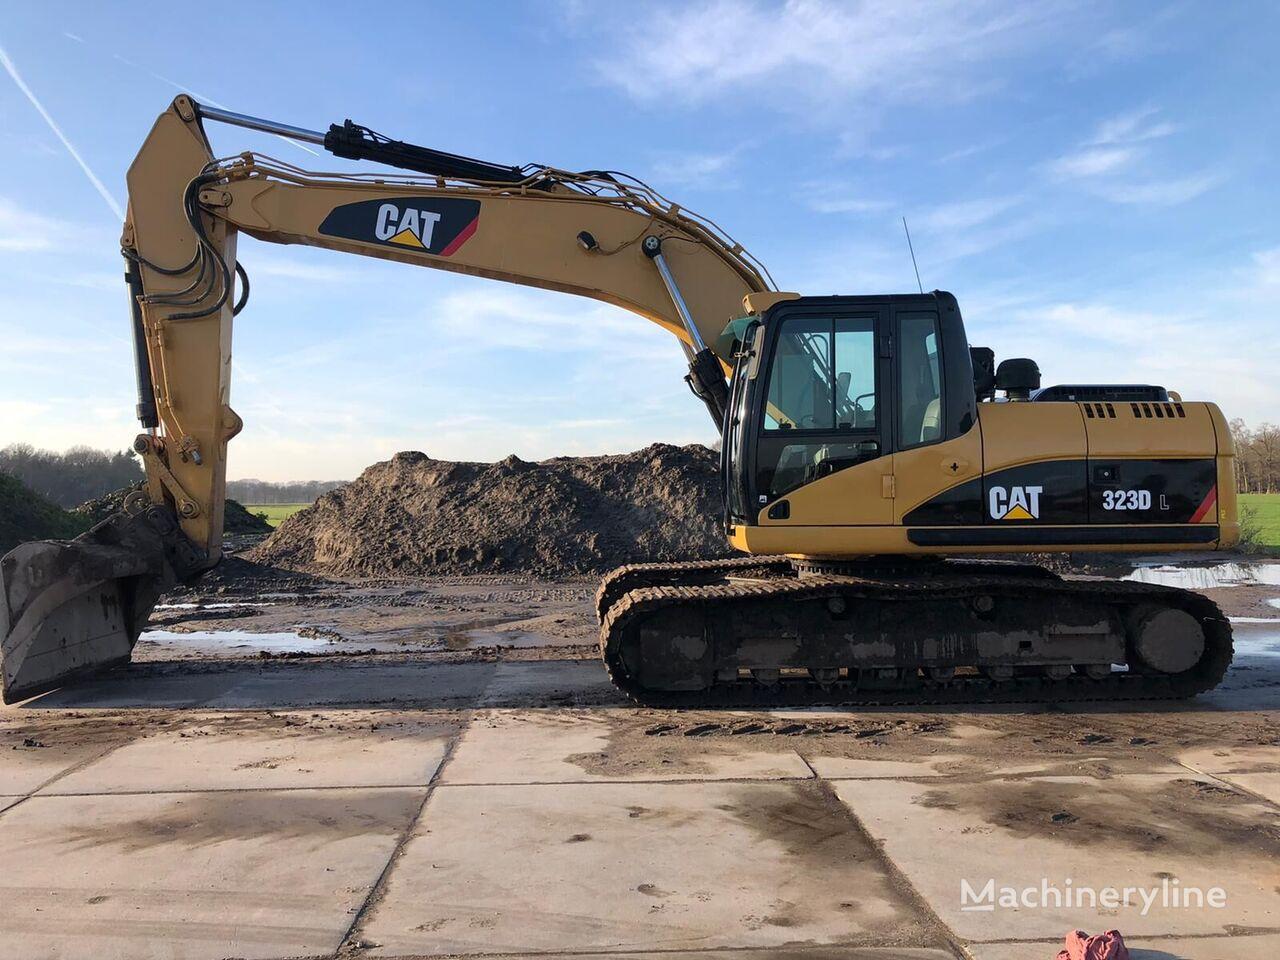 CATERPILLAR 323DL tracked excavator